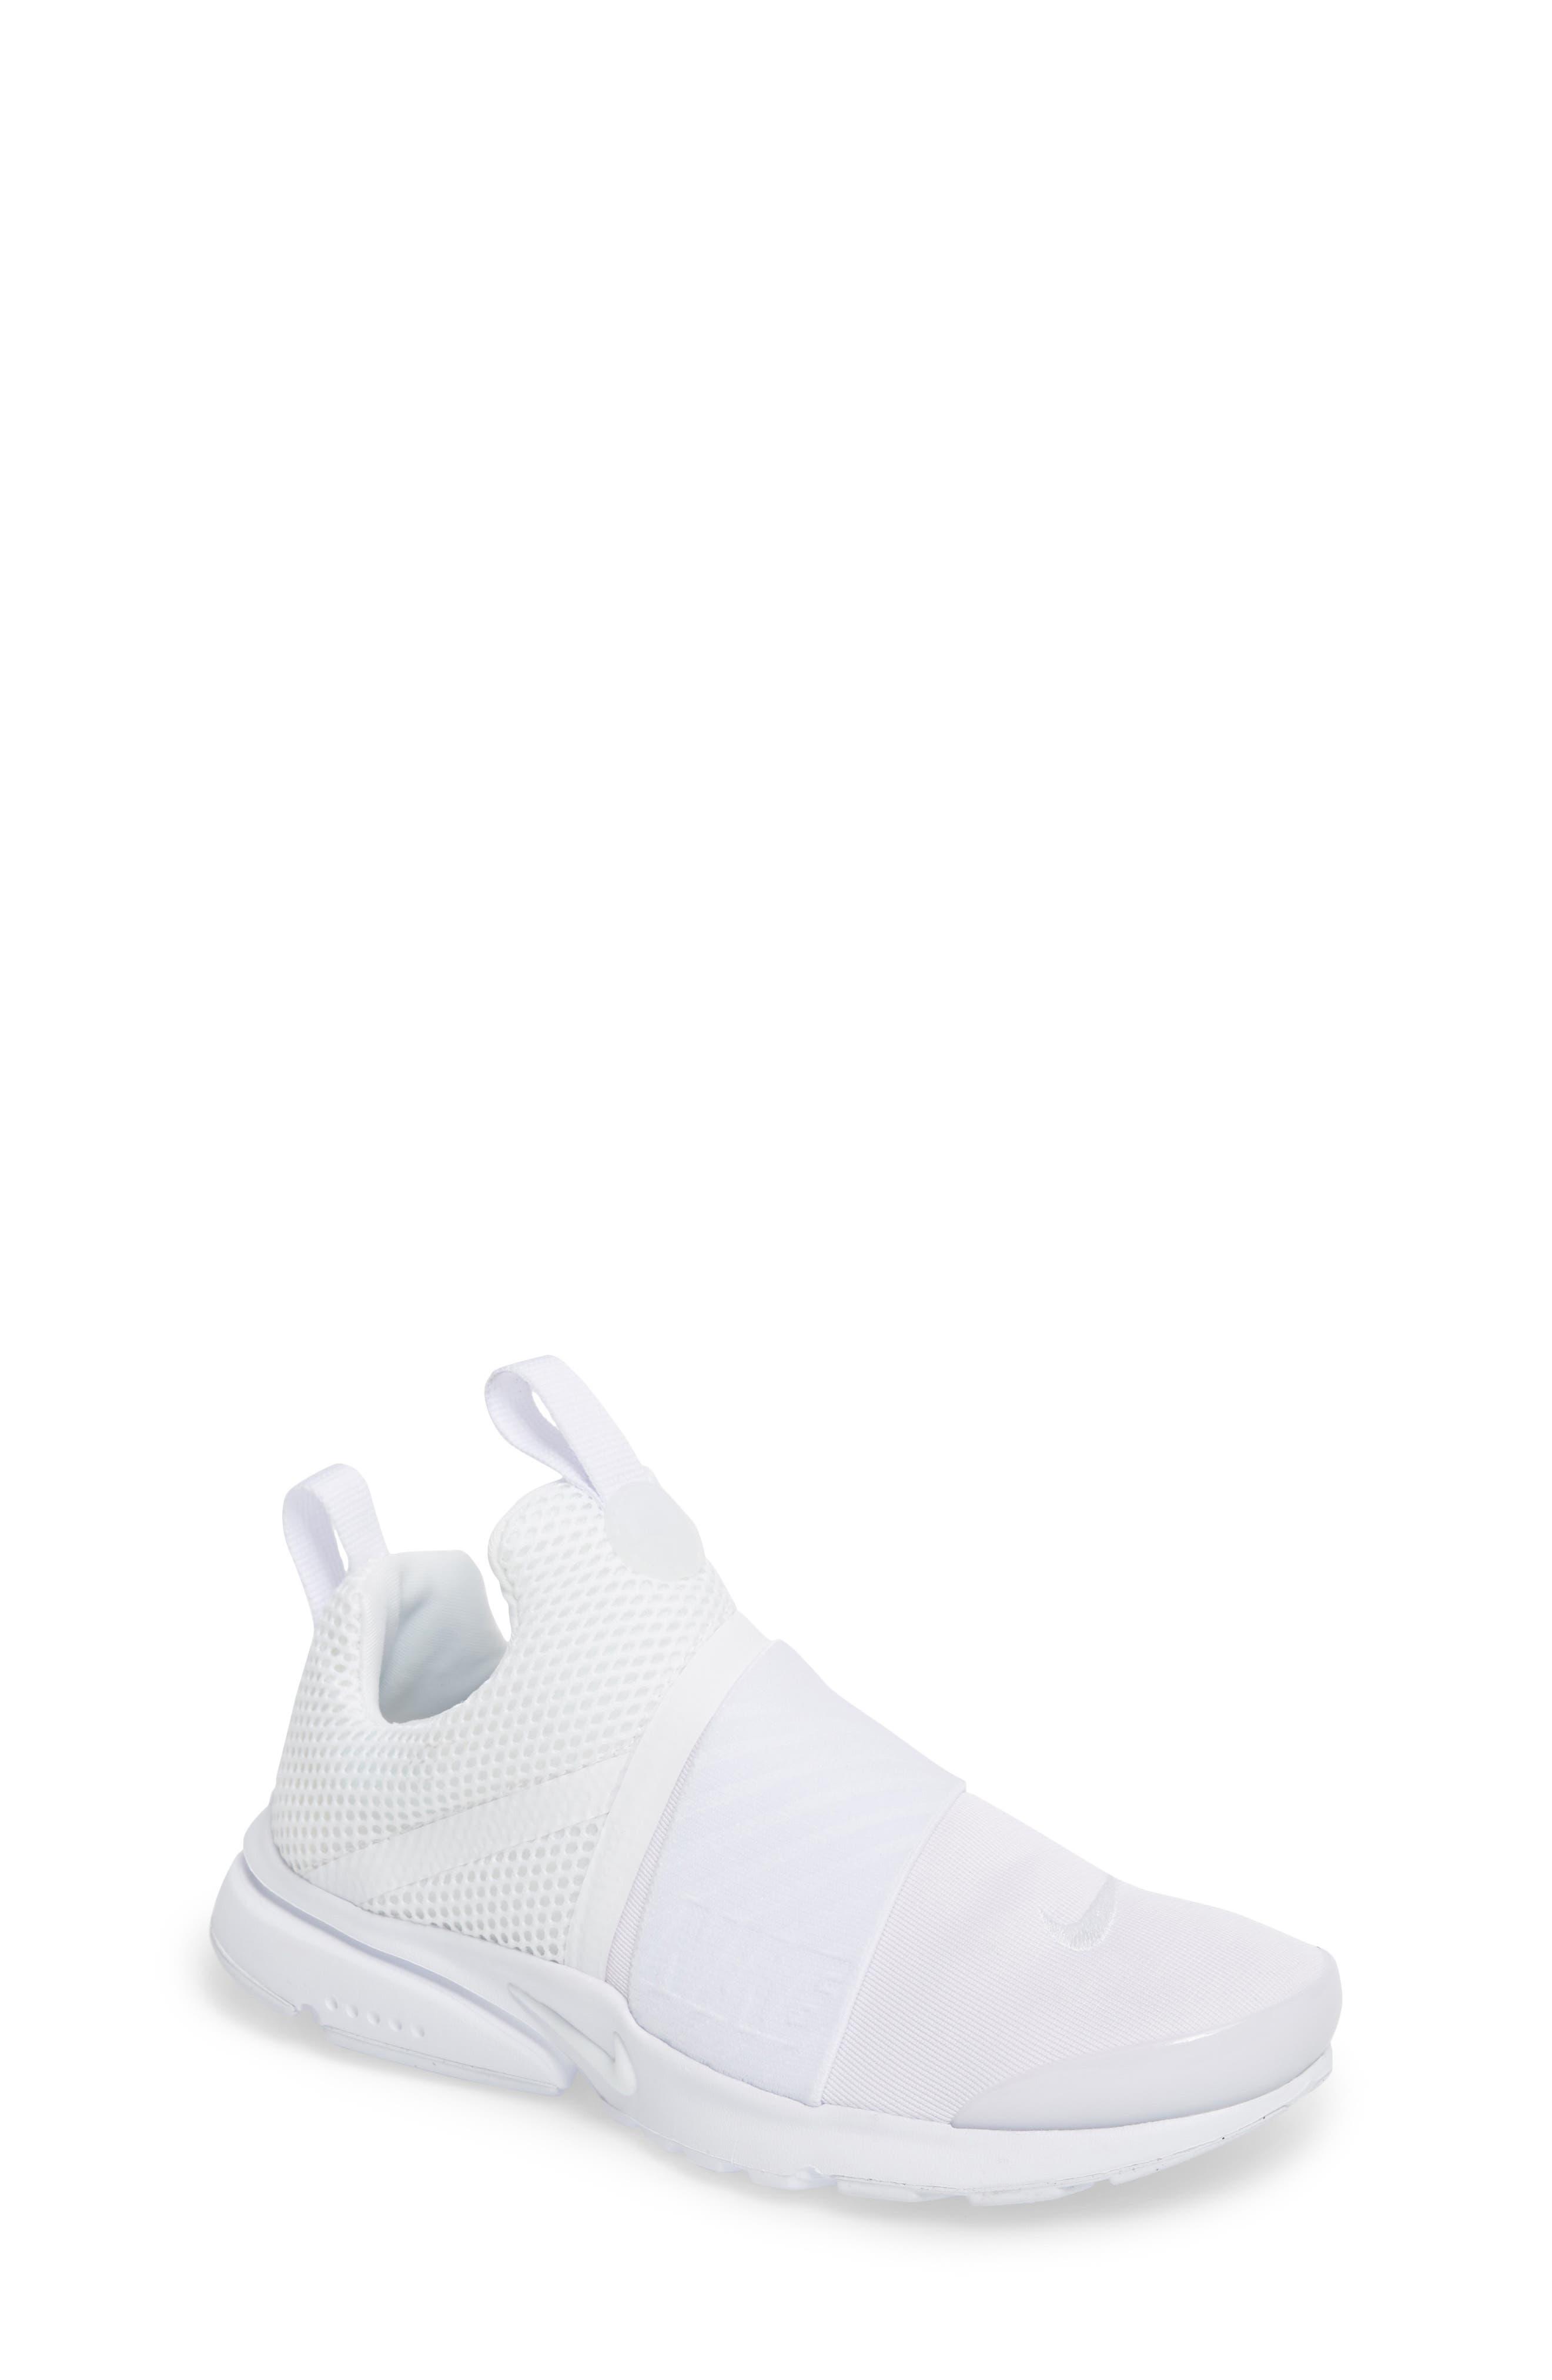 Presto Extreme Sneaker,                             Main thumbnail 4, color,